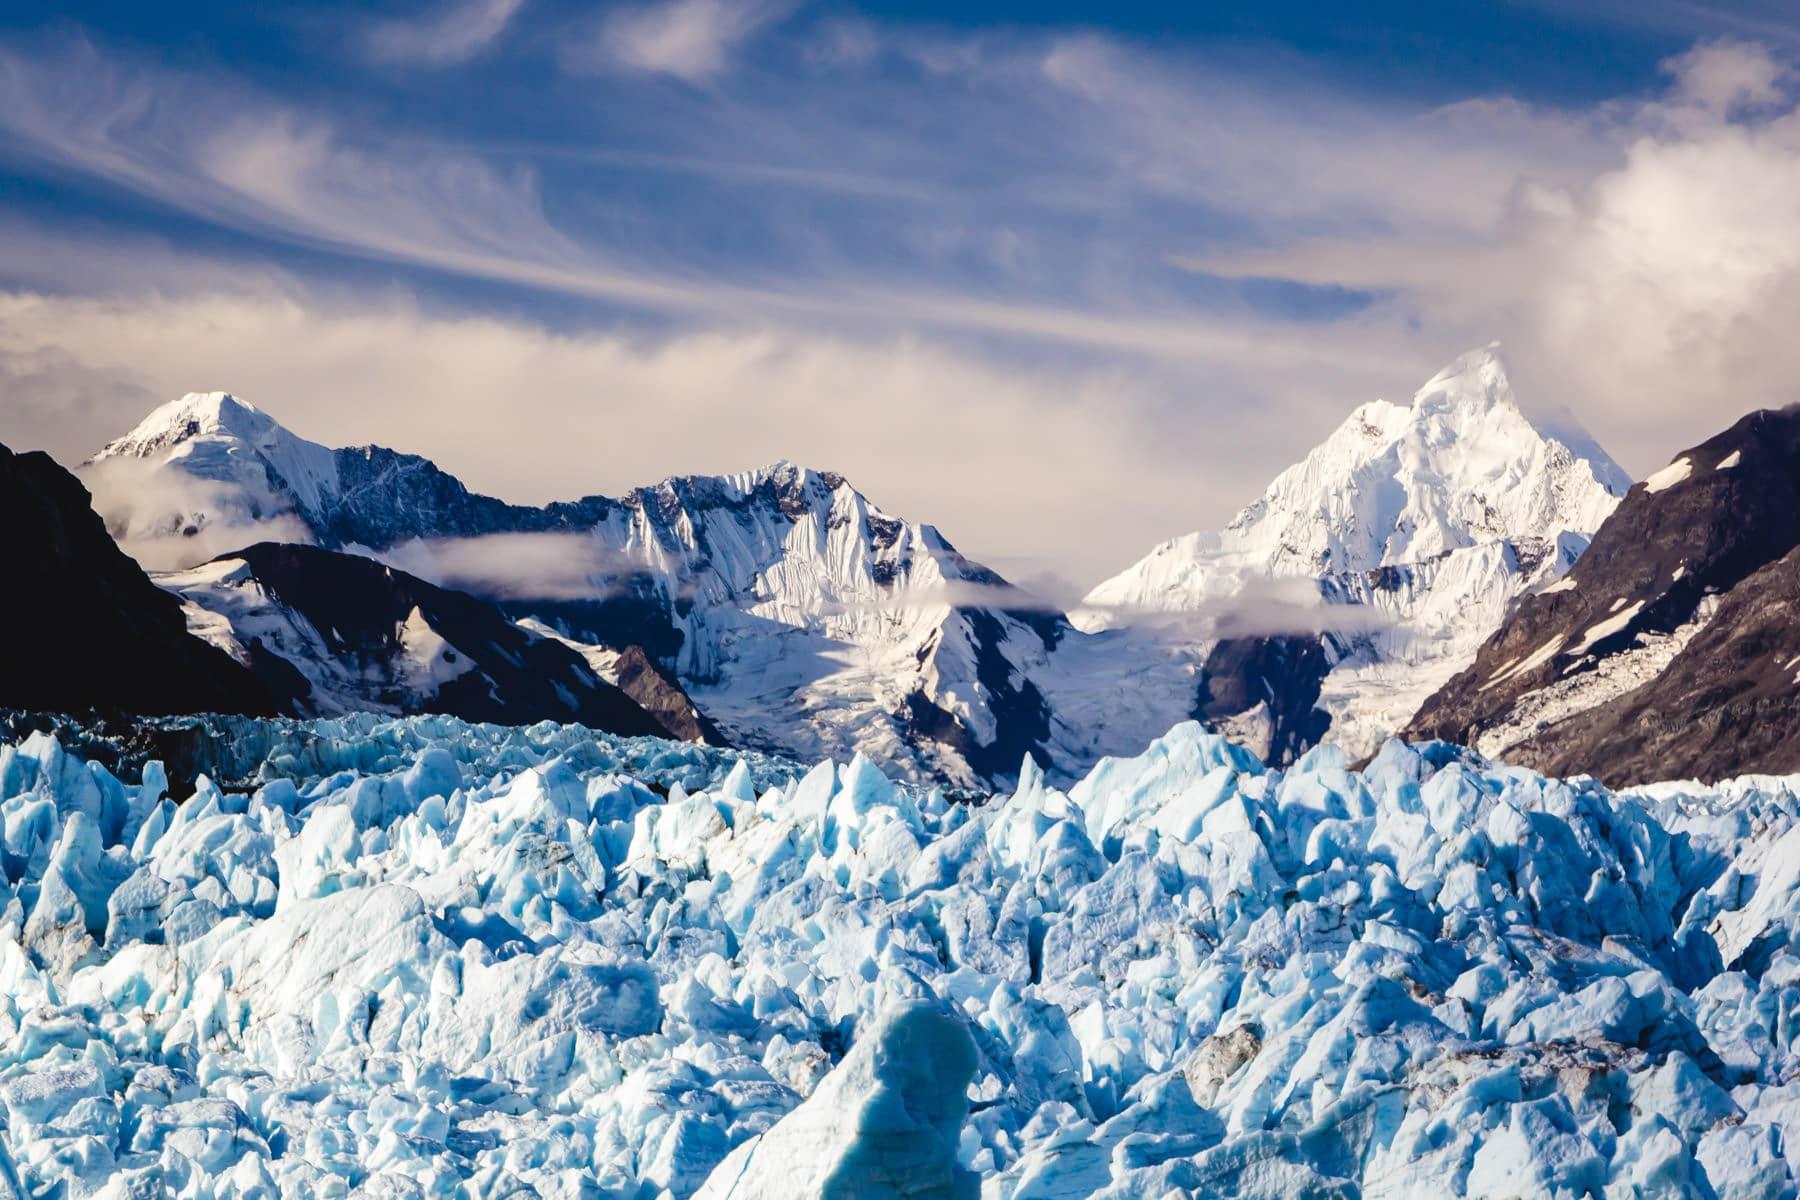 Mountains rise over the Margerie Glacier at Glacier Bay National Park, Alaska.